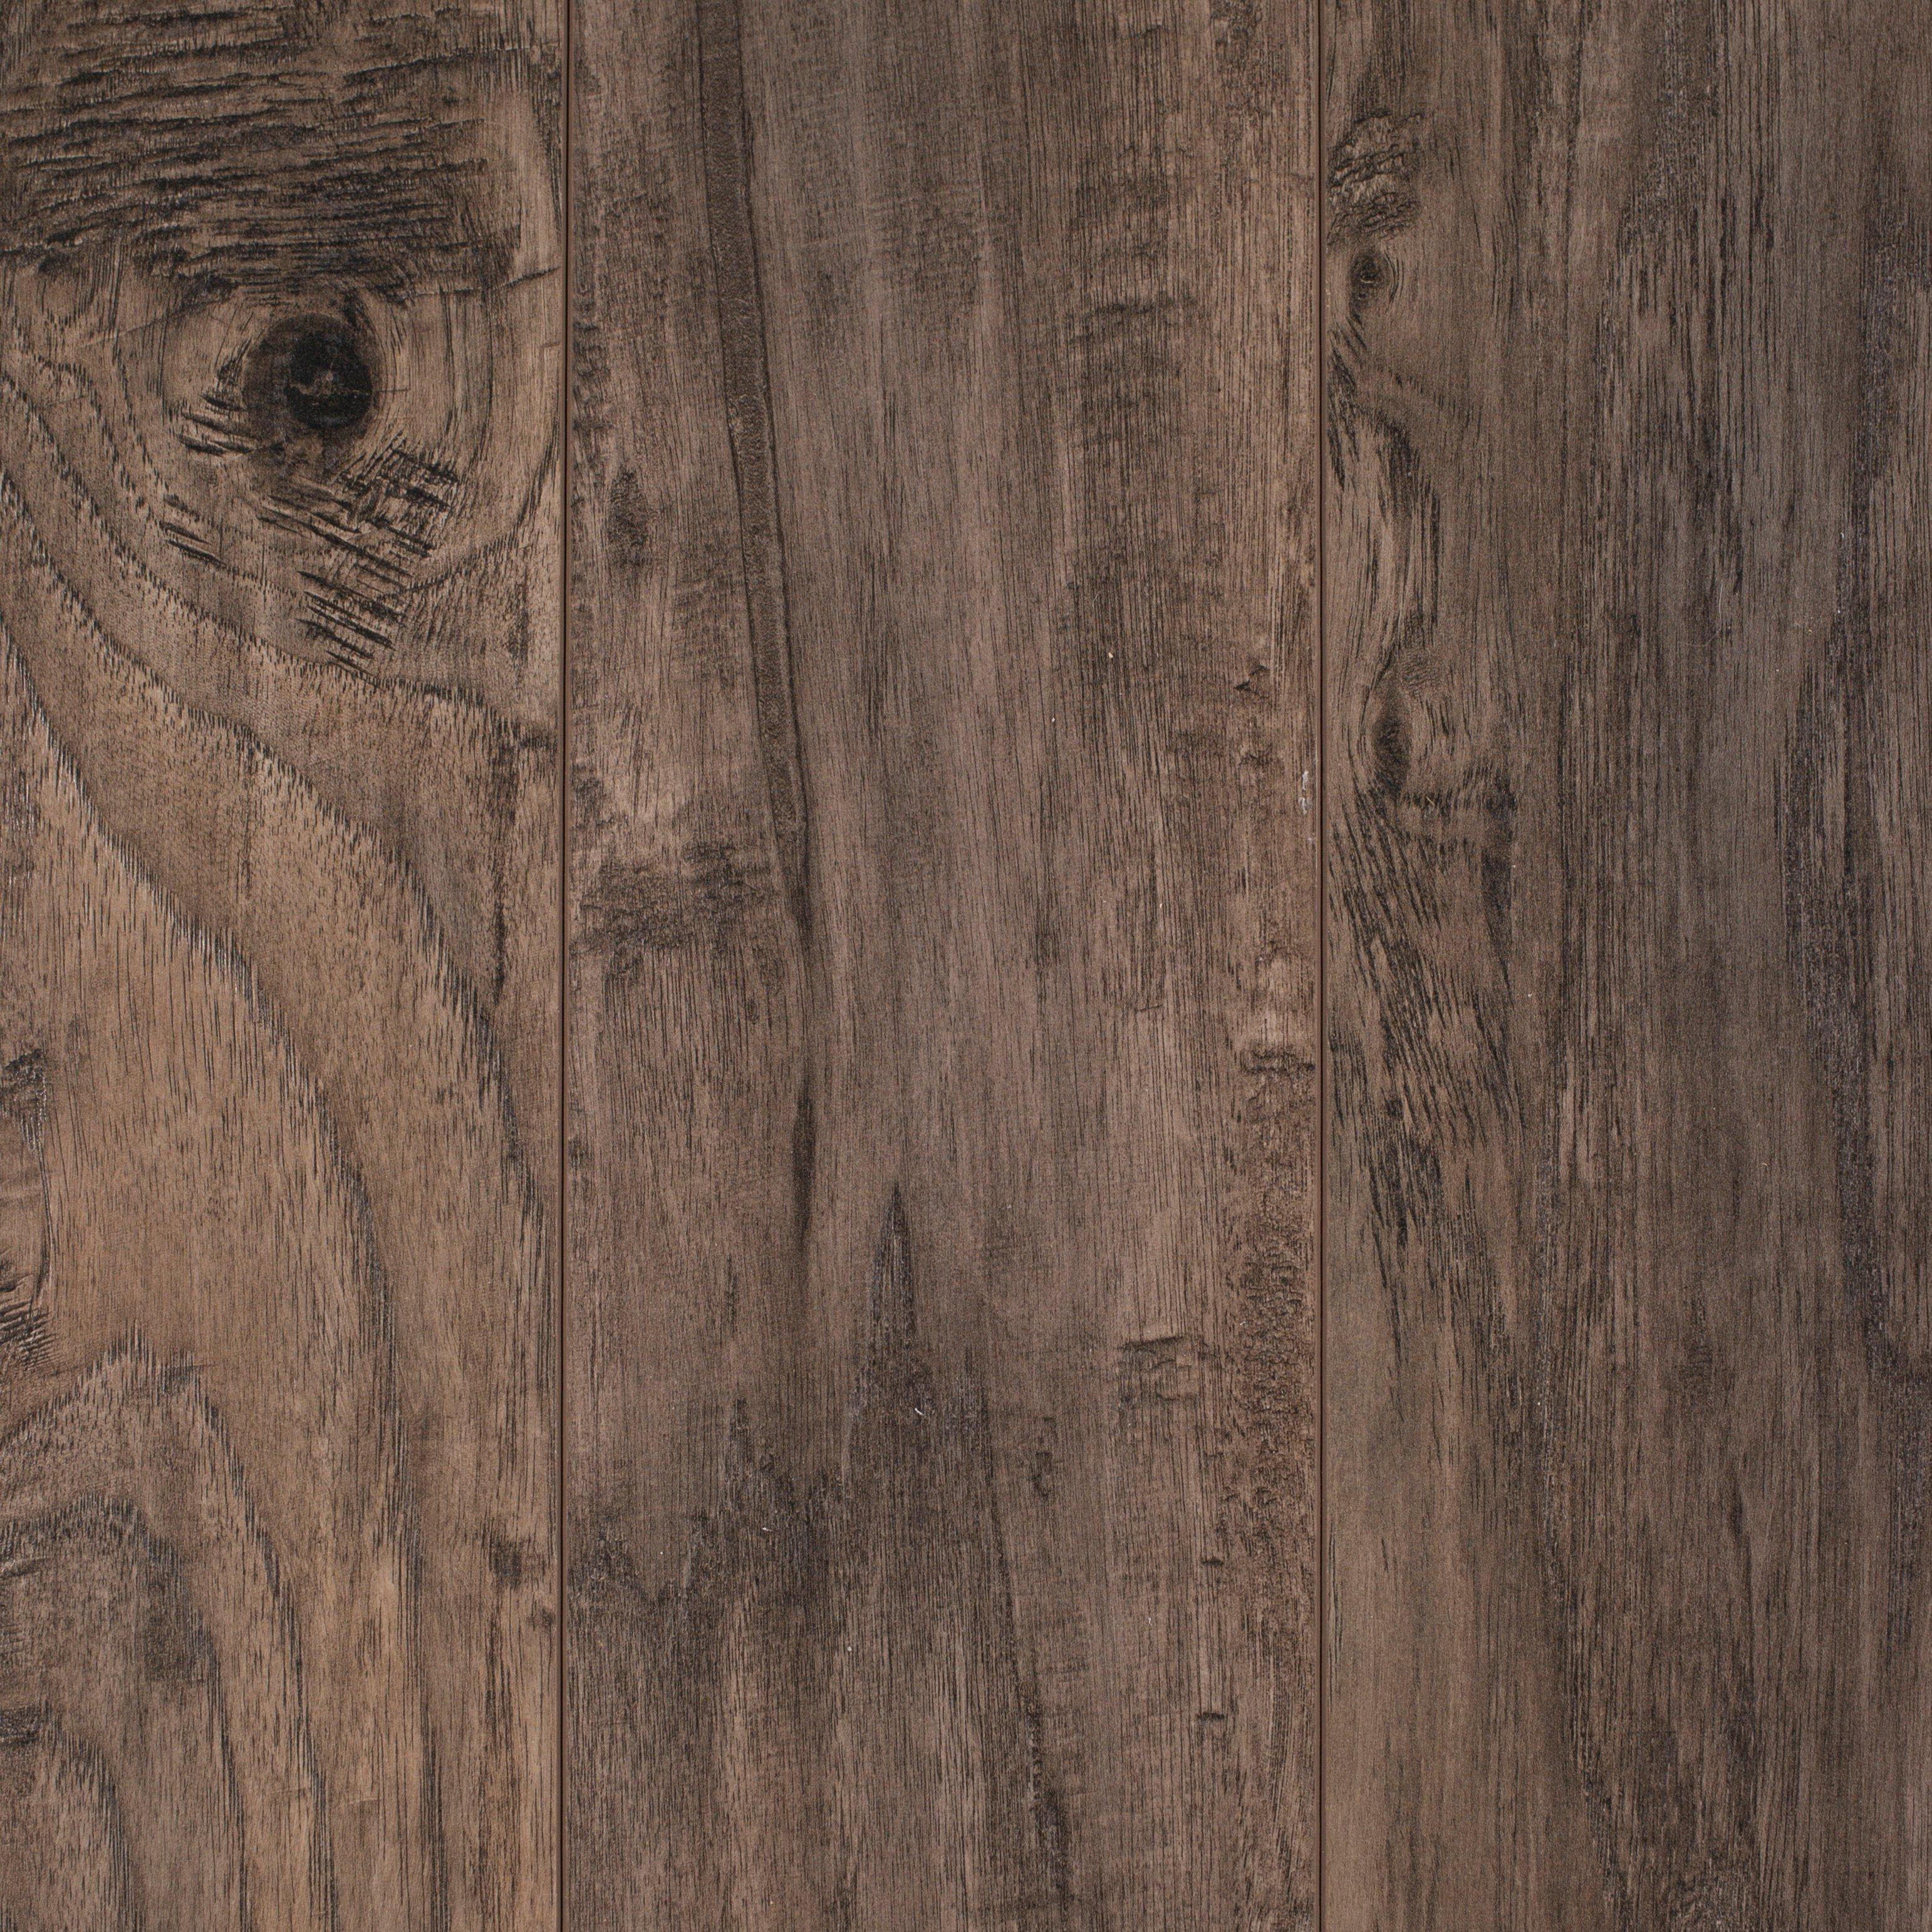 Handscraped Laminate Flooring homestead plank roasted grain laminate l6563 Cappuccino Hickory Hand Scraped Laminate 12mm 100103415 Floor And Decor